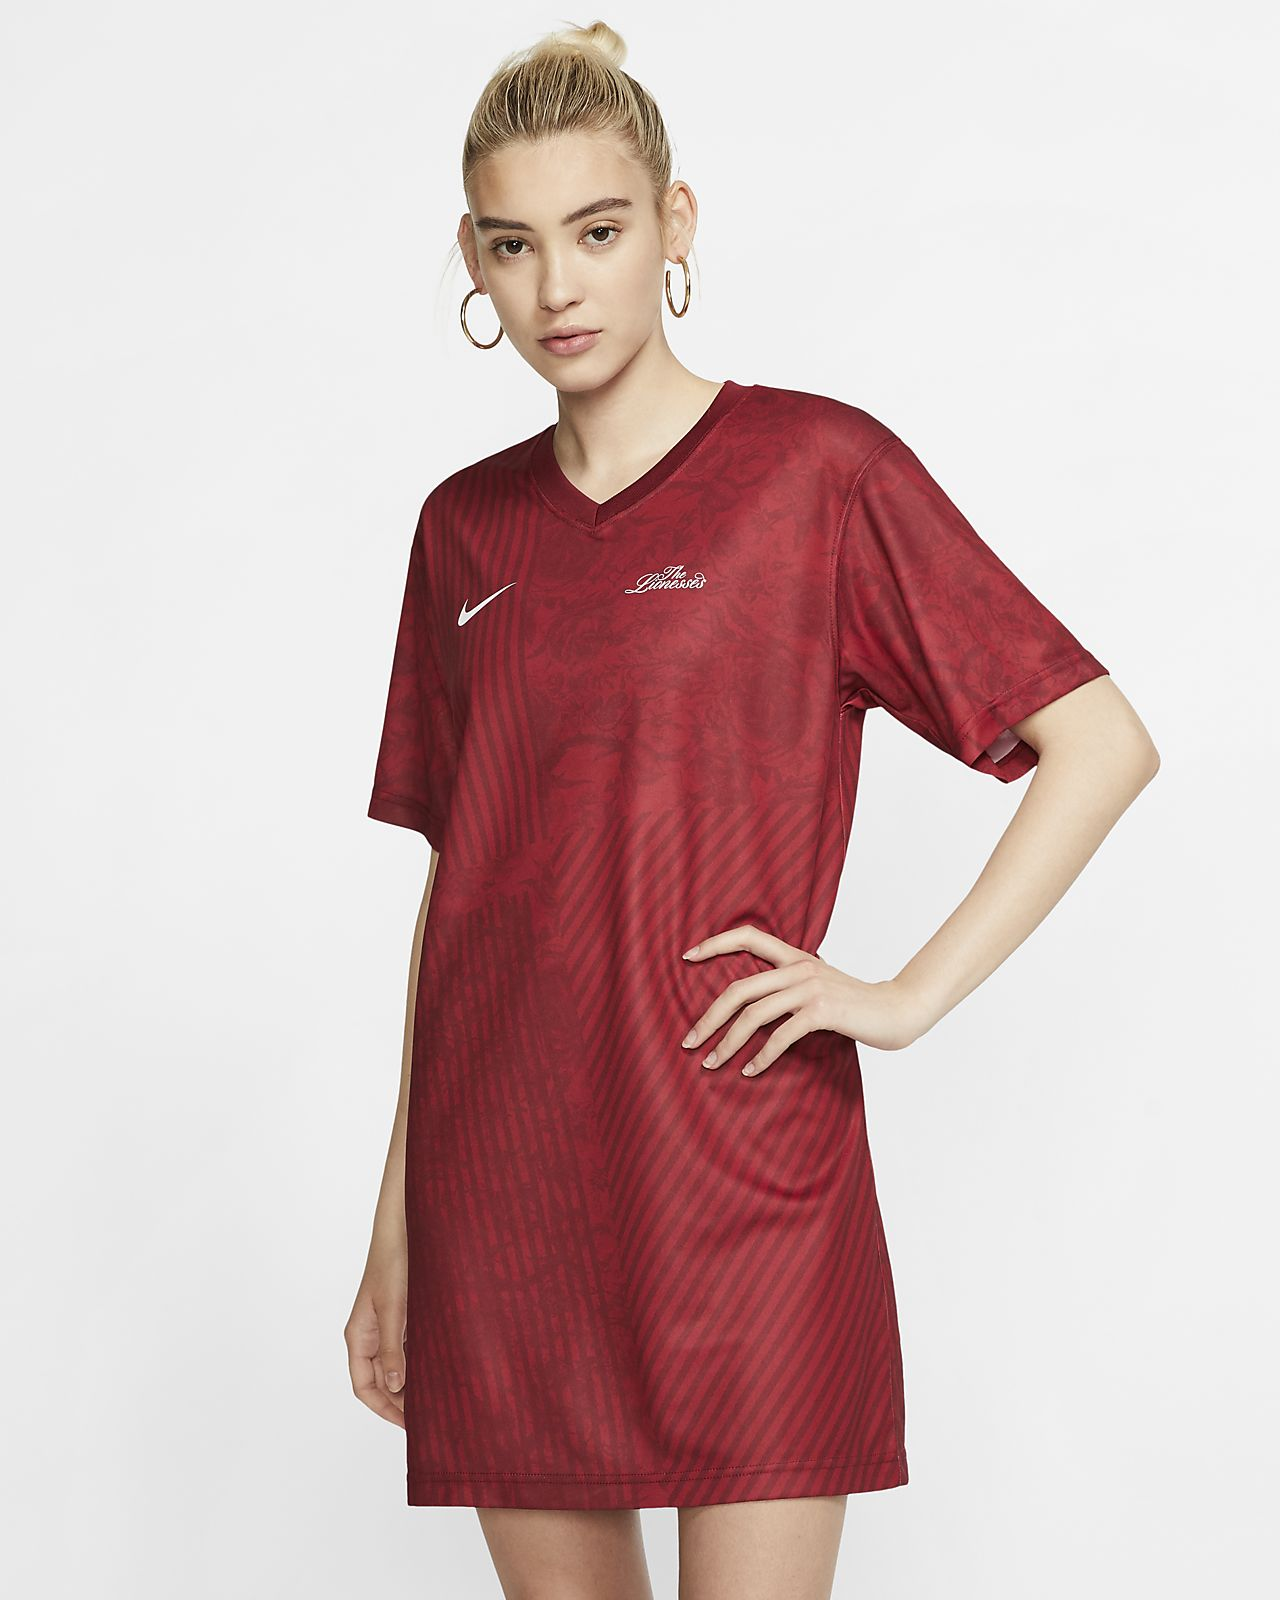 Robe Nike Sportswear Unité Totale pour Femme